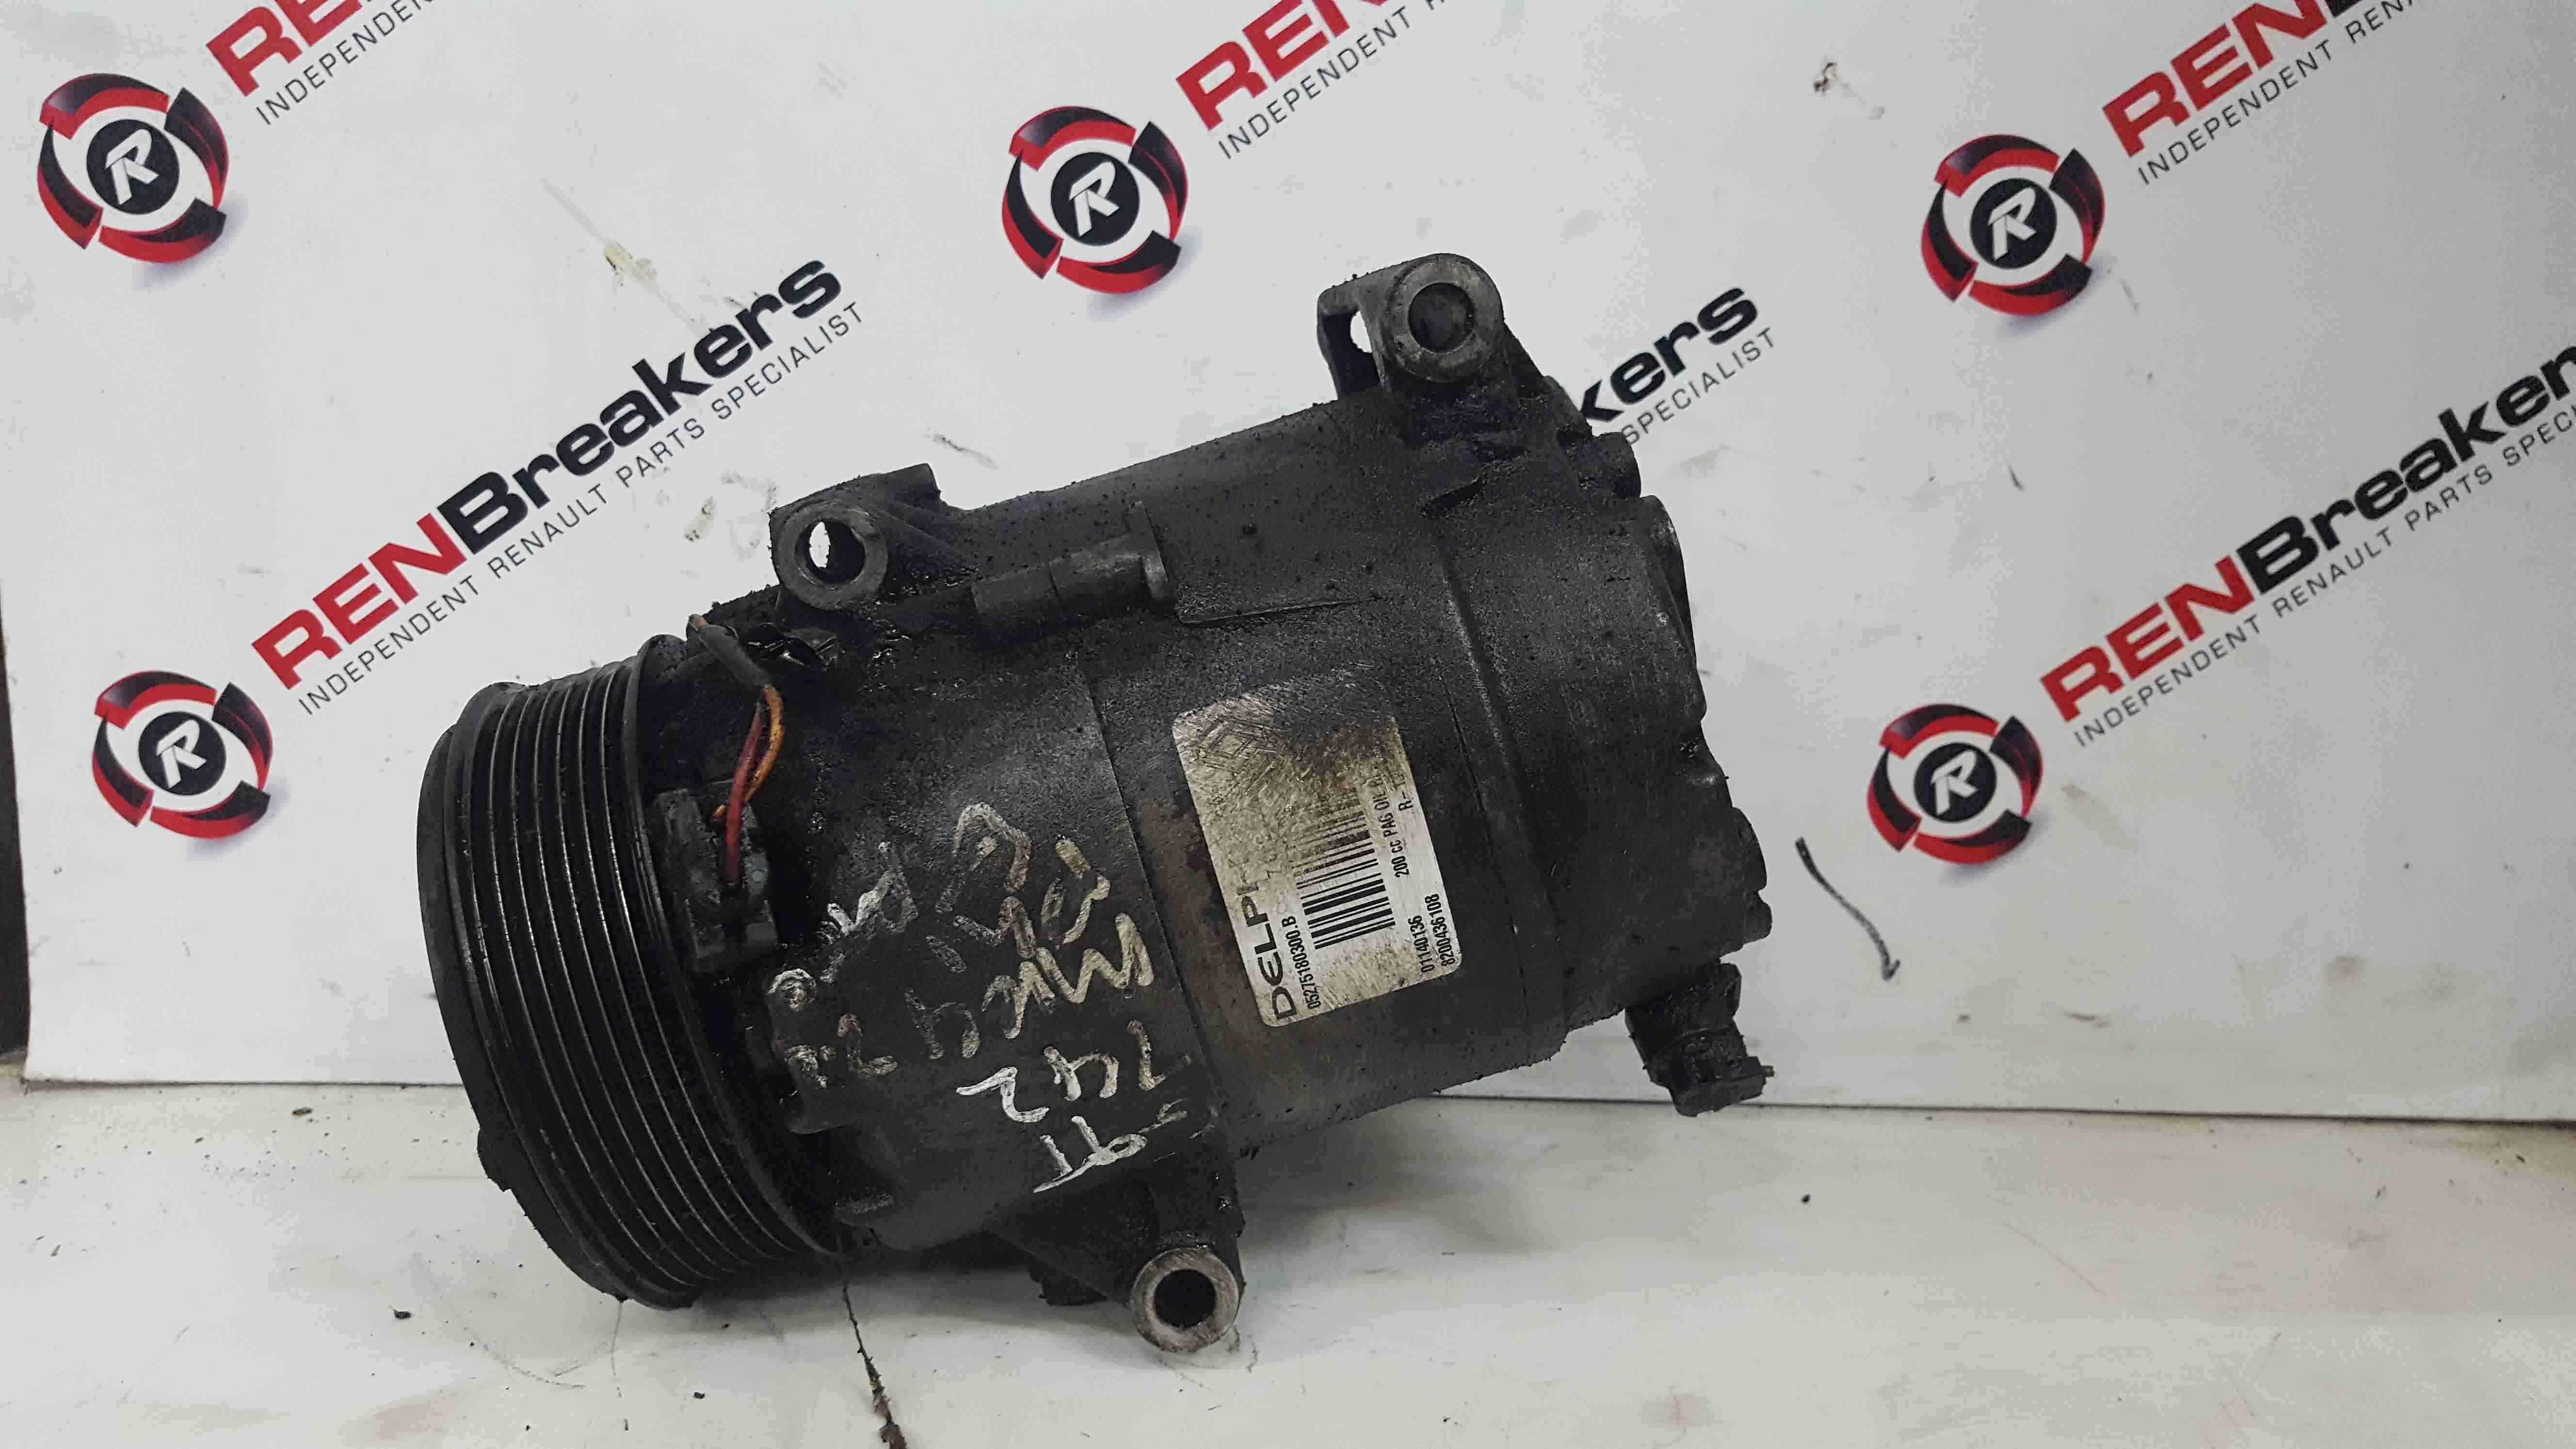 Renault Espace 2003-2013 Aircon Pump Compressor Unit 8200436108